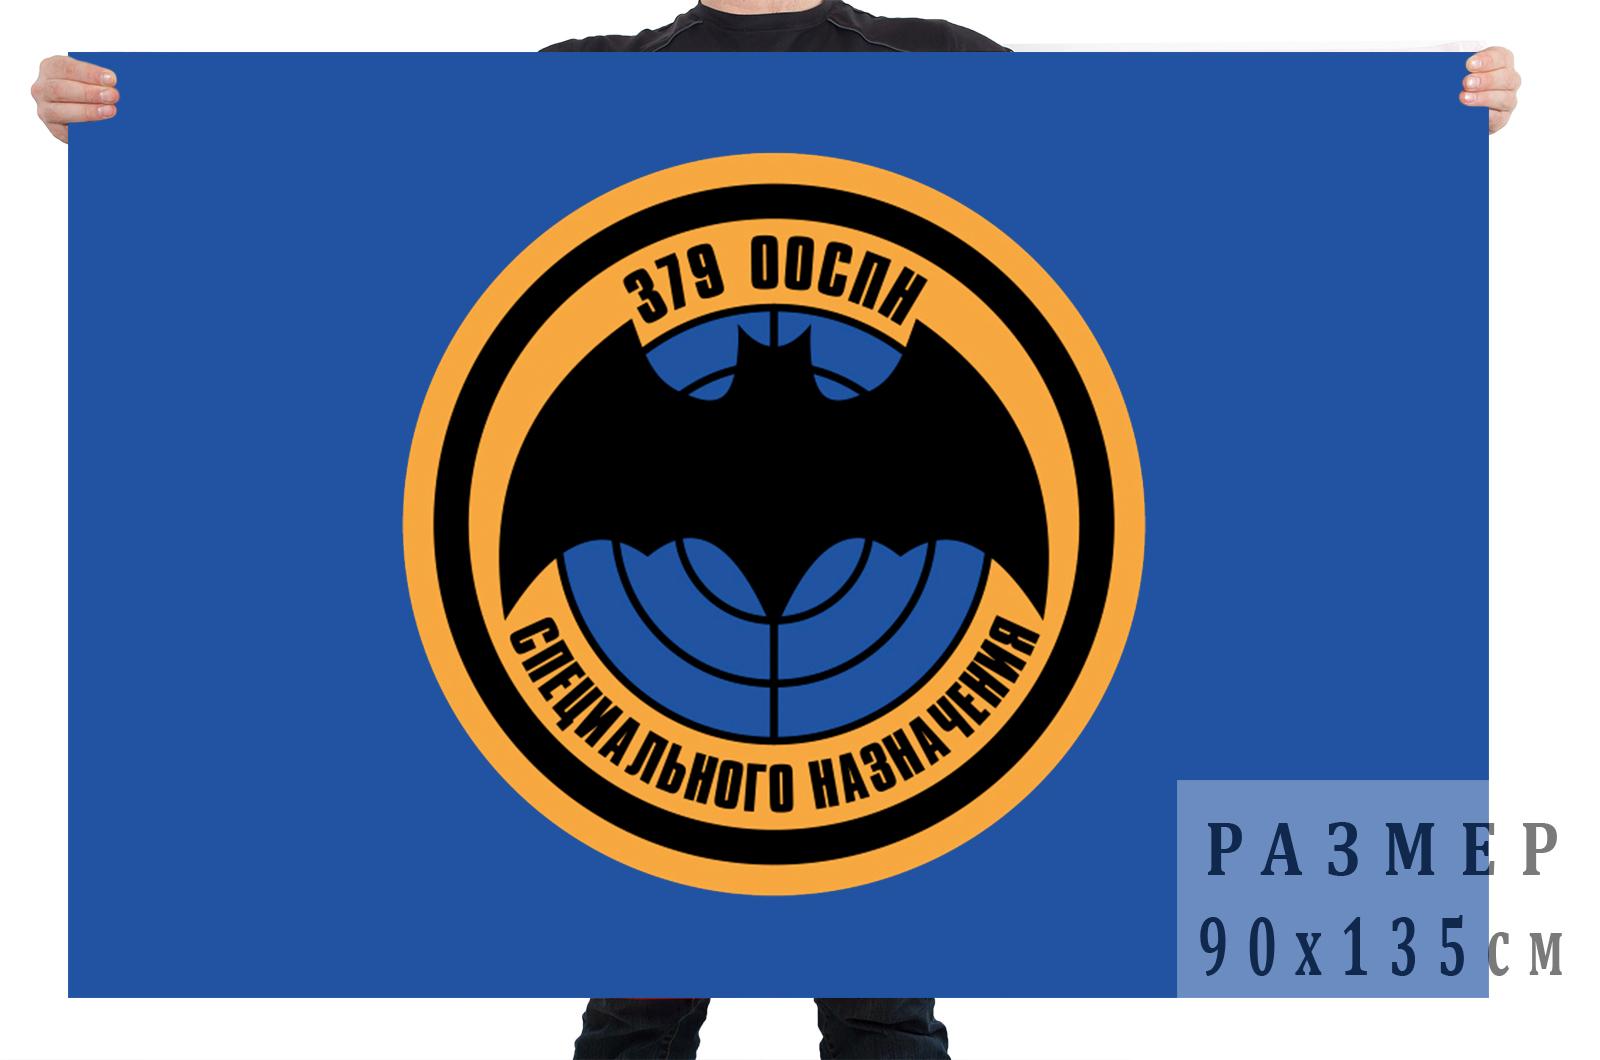 Флаг 379 ООСпН спецназа ГРУ